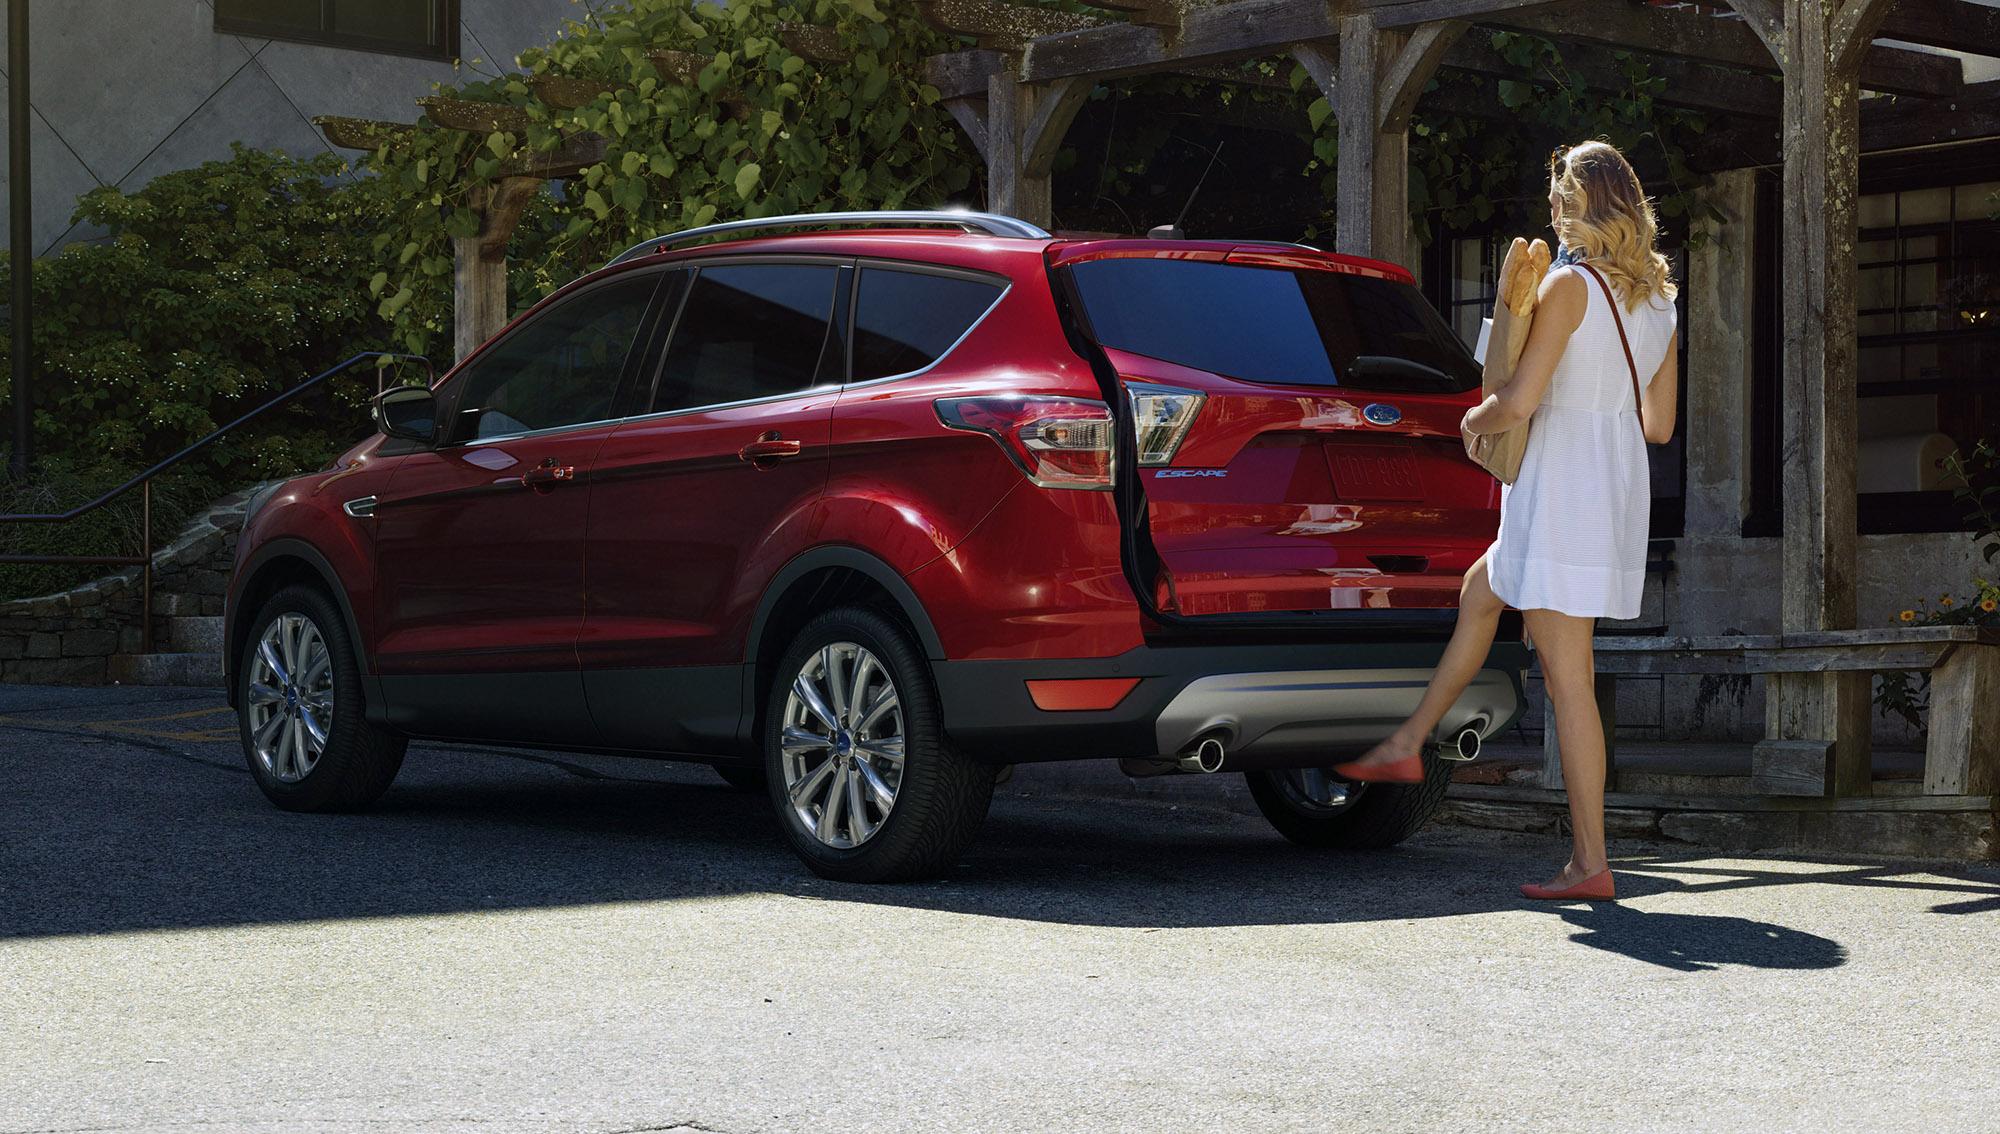 Image Result For Ford Kuga New Shape